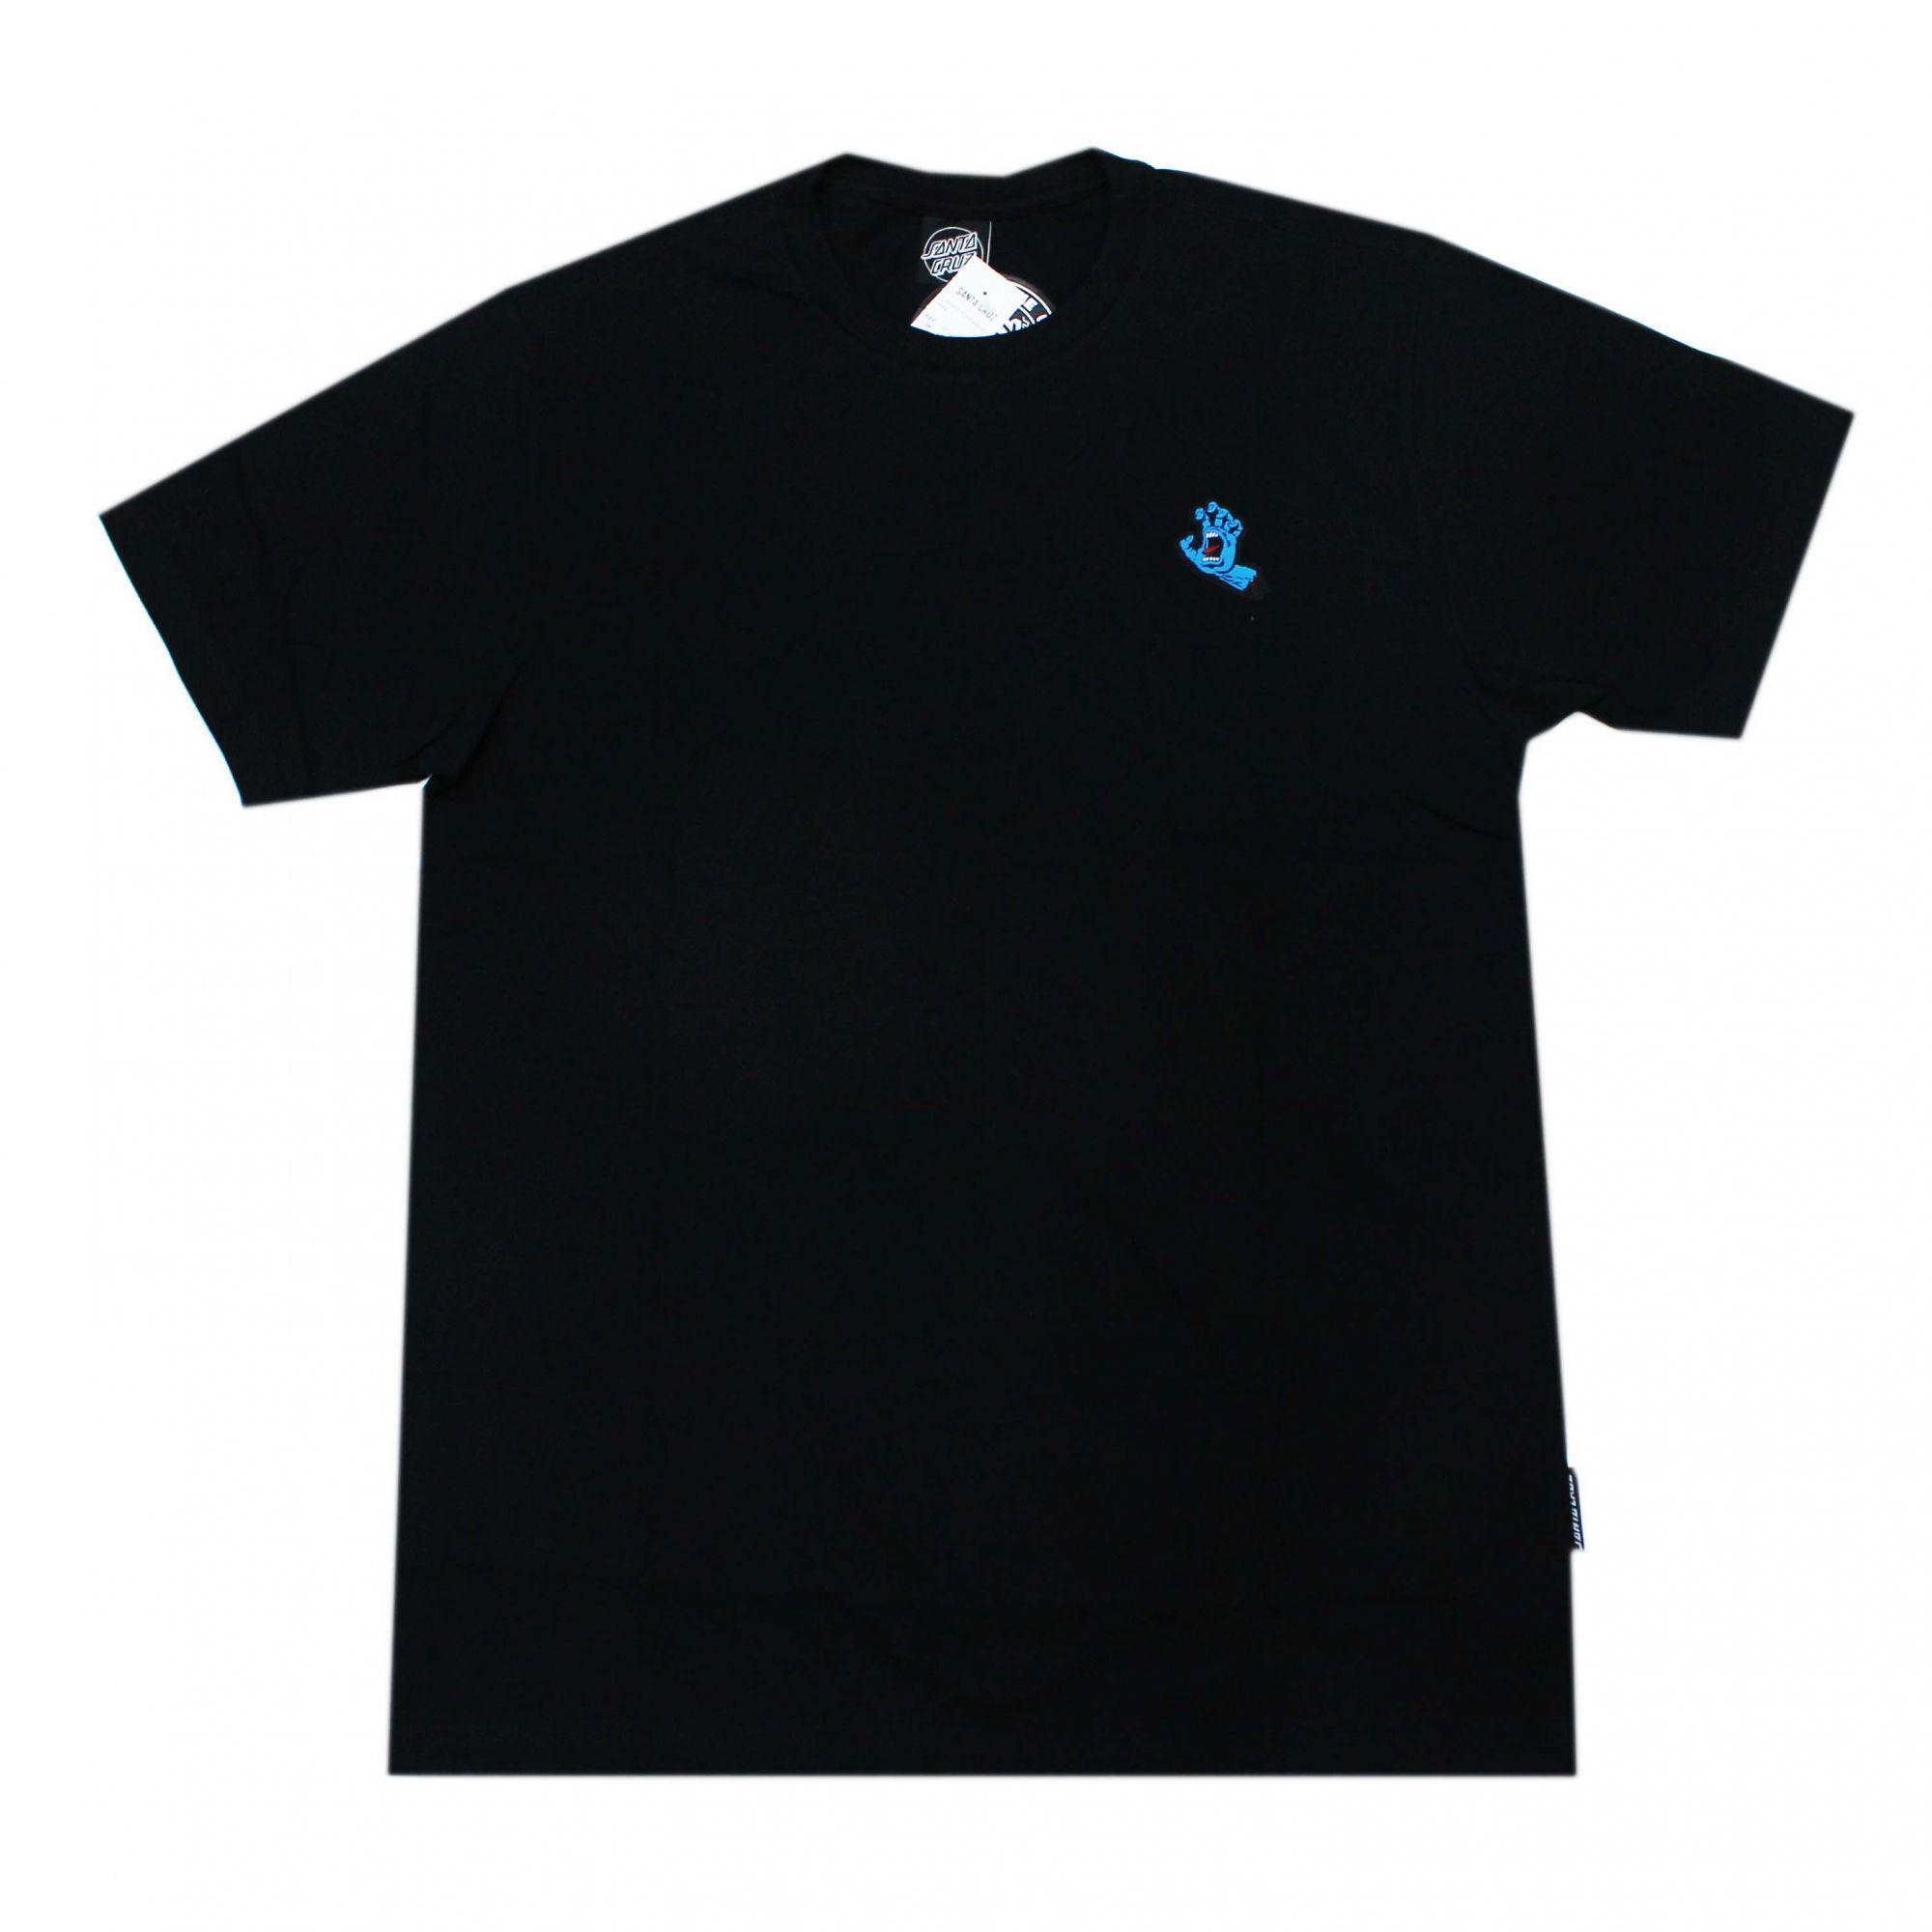 Camiseta Santa Cruz Mini Patch Screaming Hand - Preto